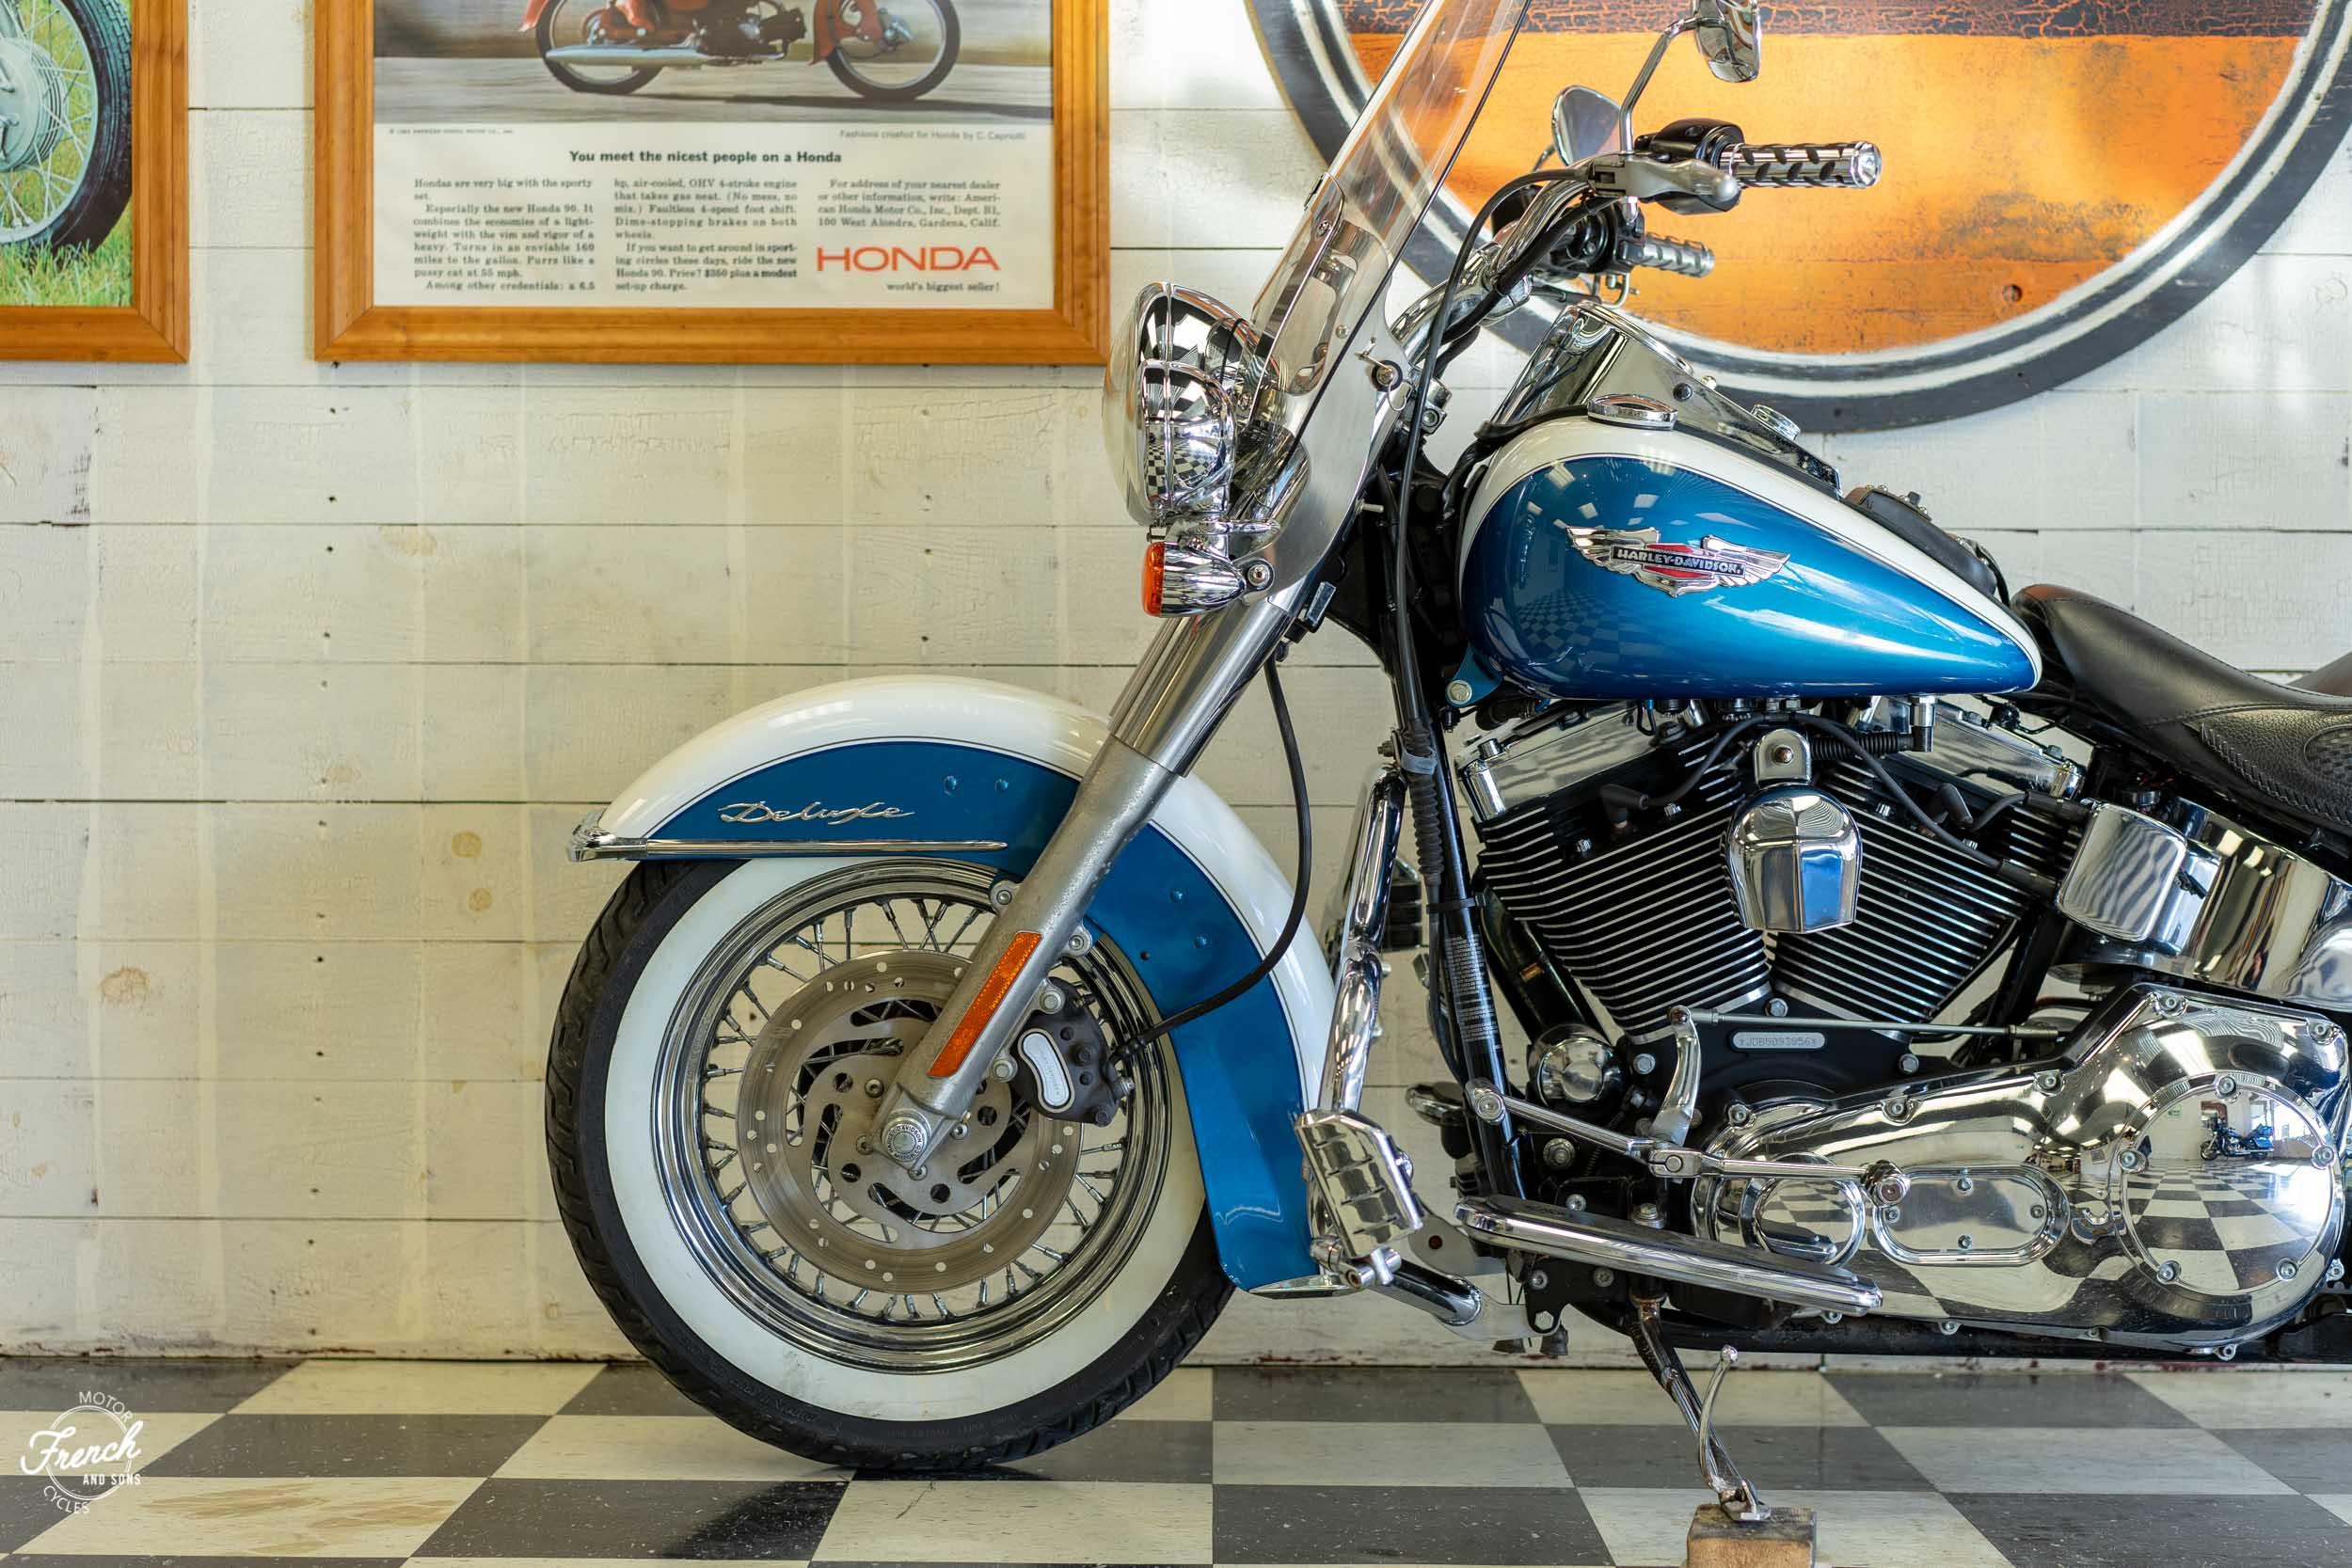 2005_Harley_Davidson_Softail_Deluxe-16.jpg